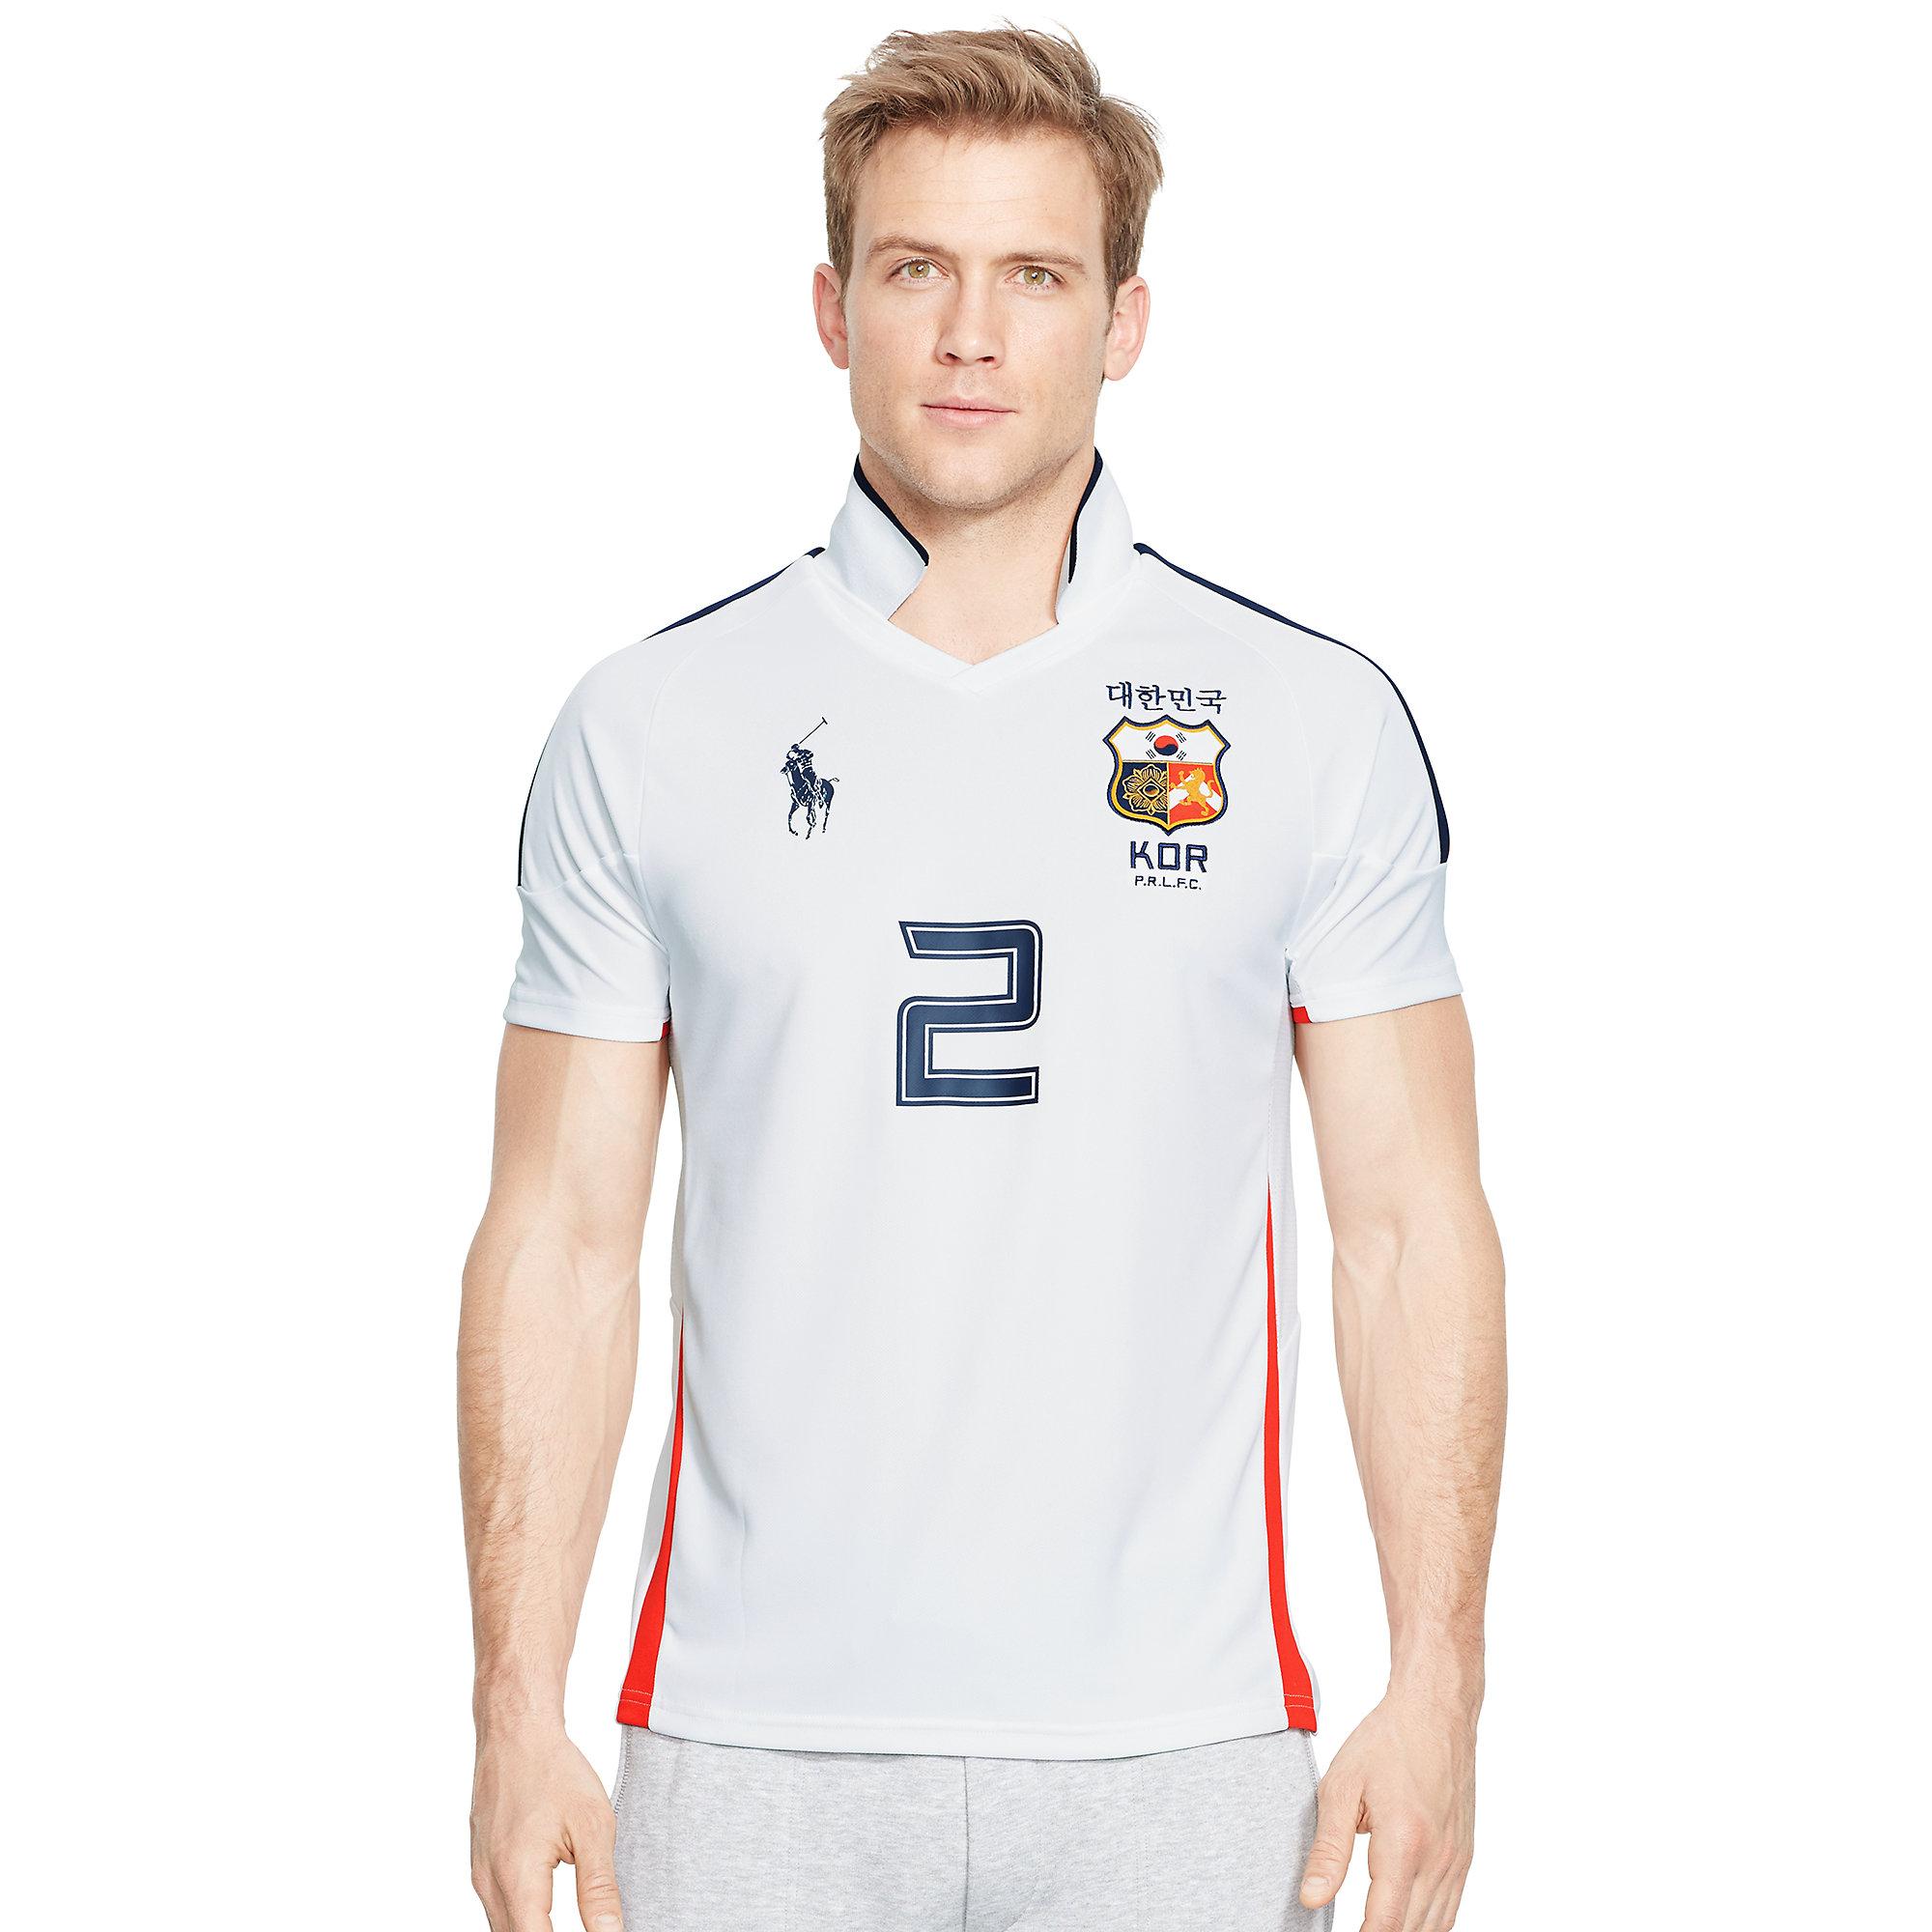 Ralph lauren korea jersey polo shirt in white for men lyst for Ralph lauren polo jersey shirt